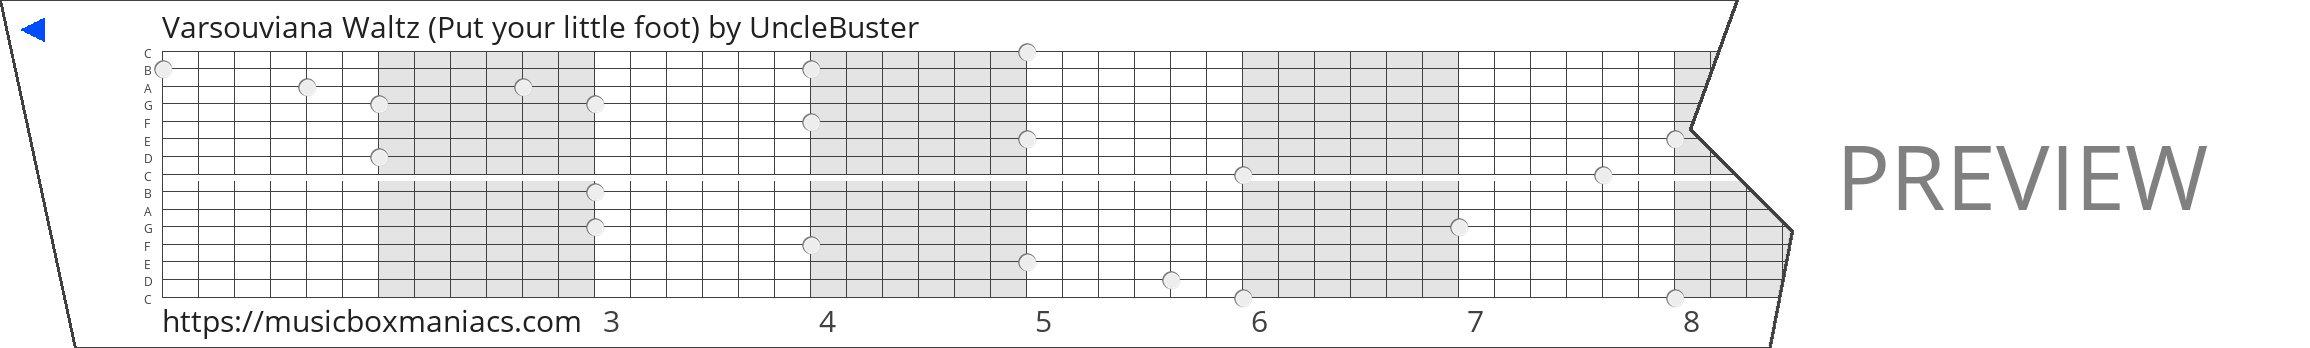 Varsouviana Waltz (Put your little foot) 15 note music box paper strip